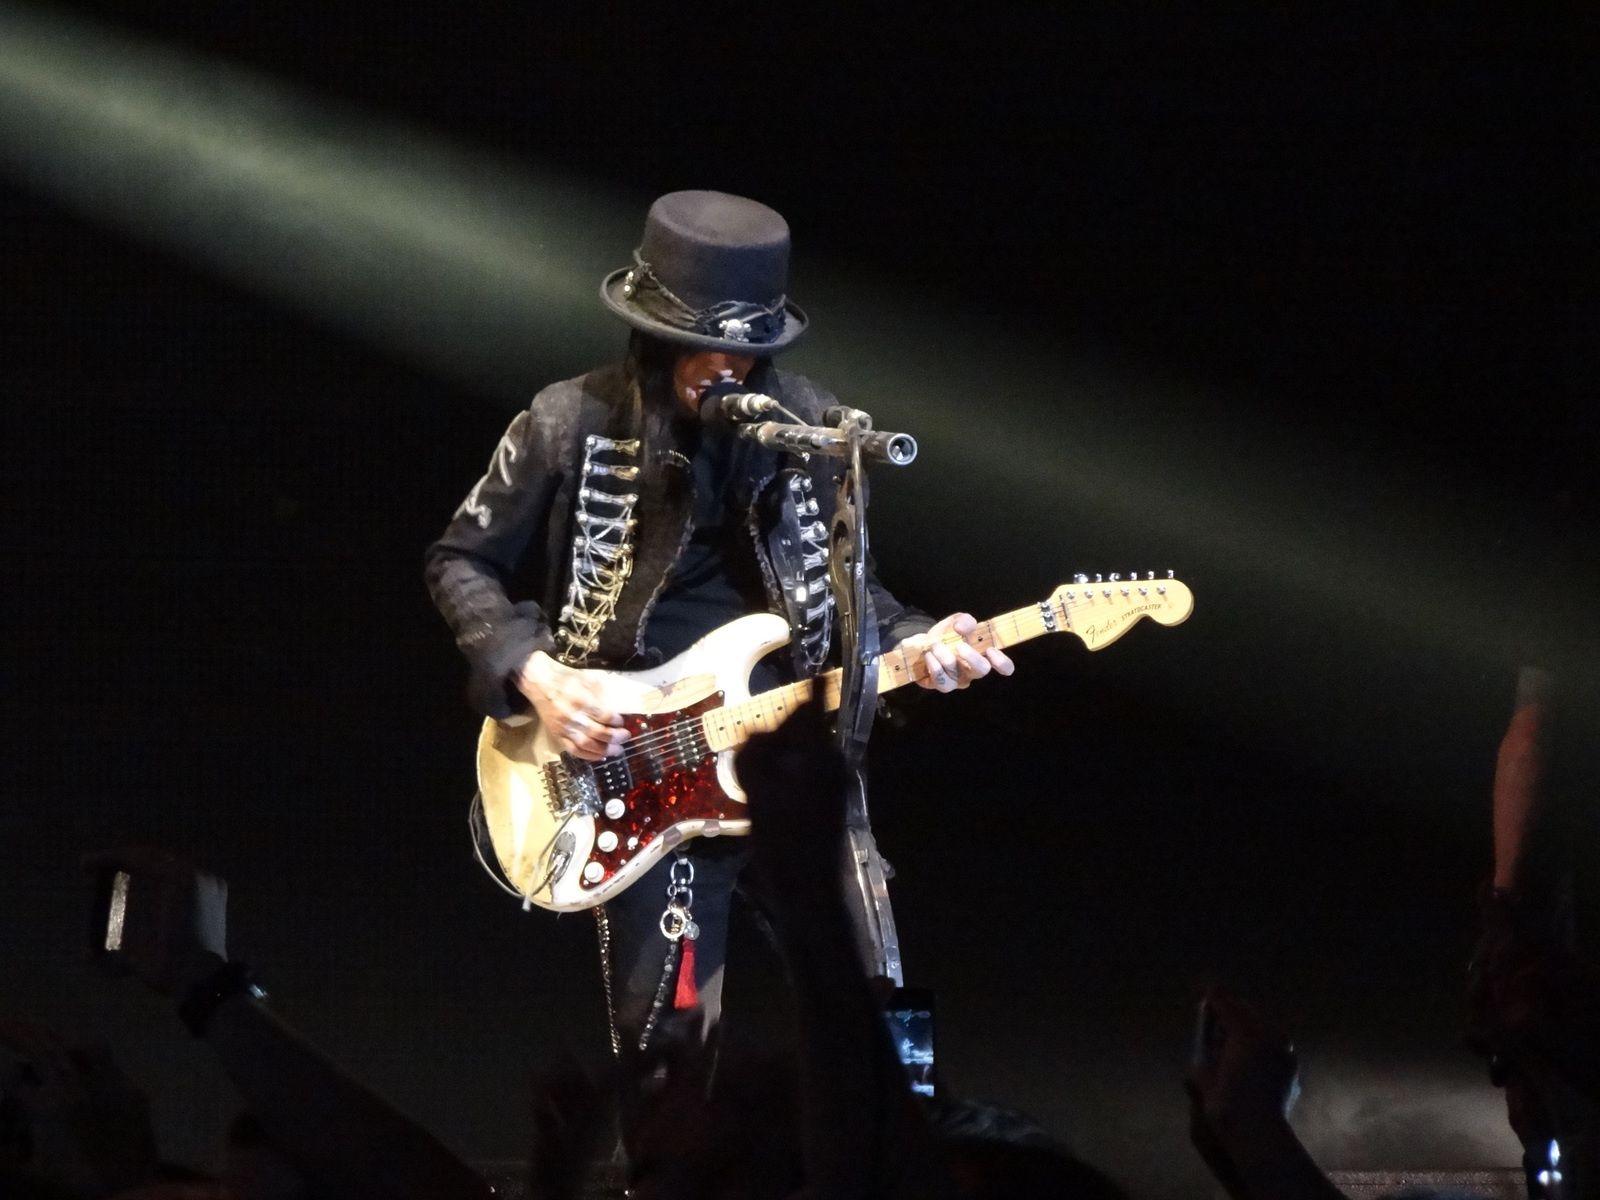 Mick Mars - February 4, 2012 - Mötley Crüe